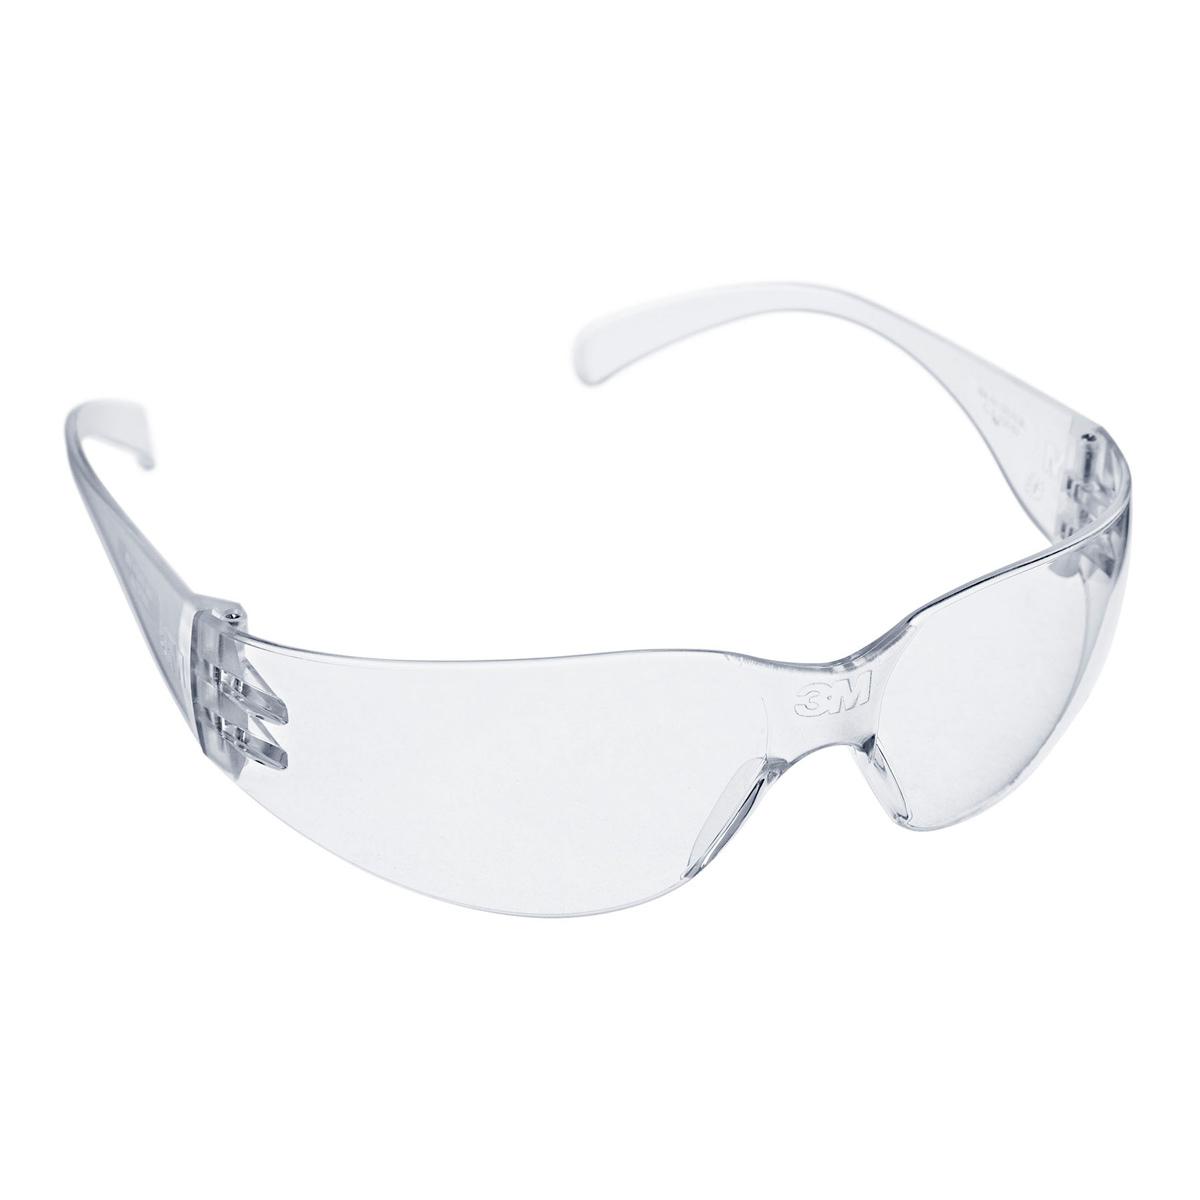 343c06f61d310 Óculos de Proteção Vírtua Incolor 3M